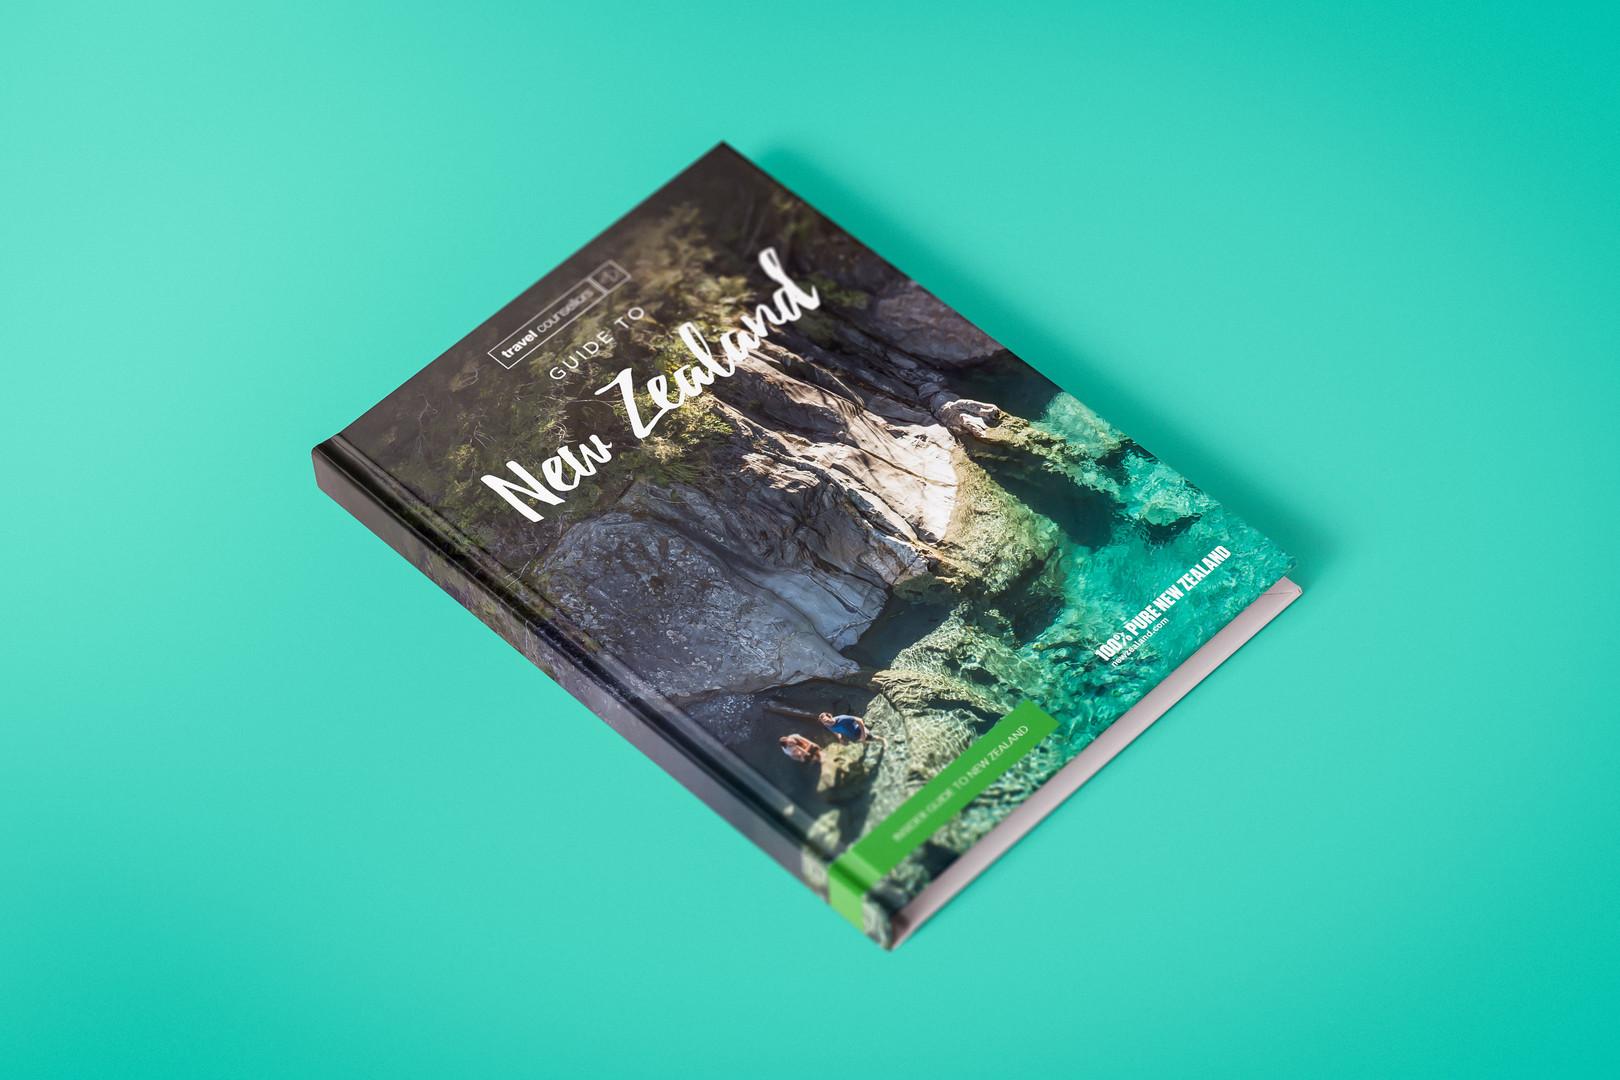 New-Zealand-cover.jpg